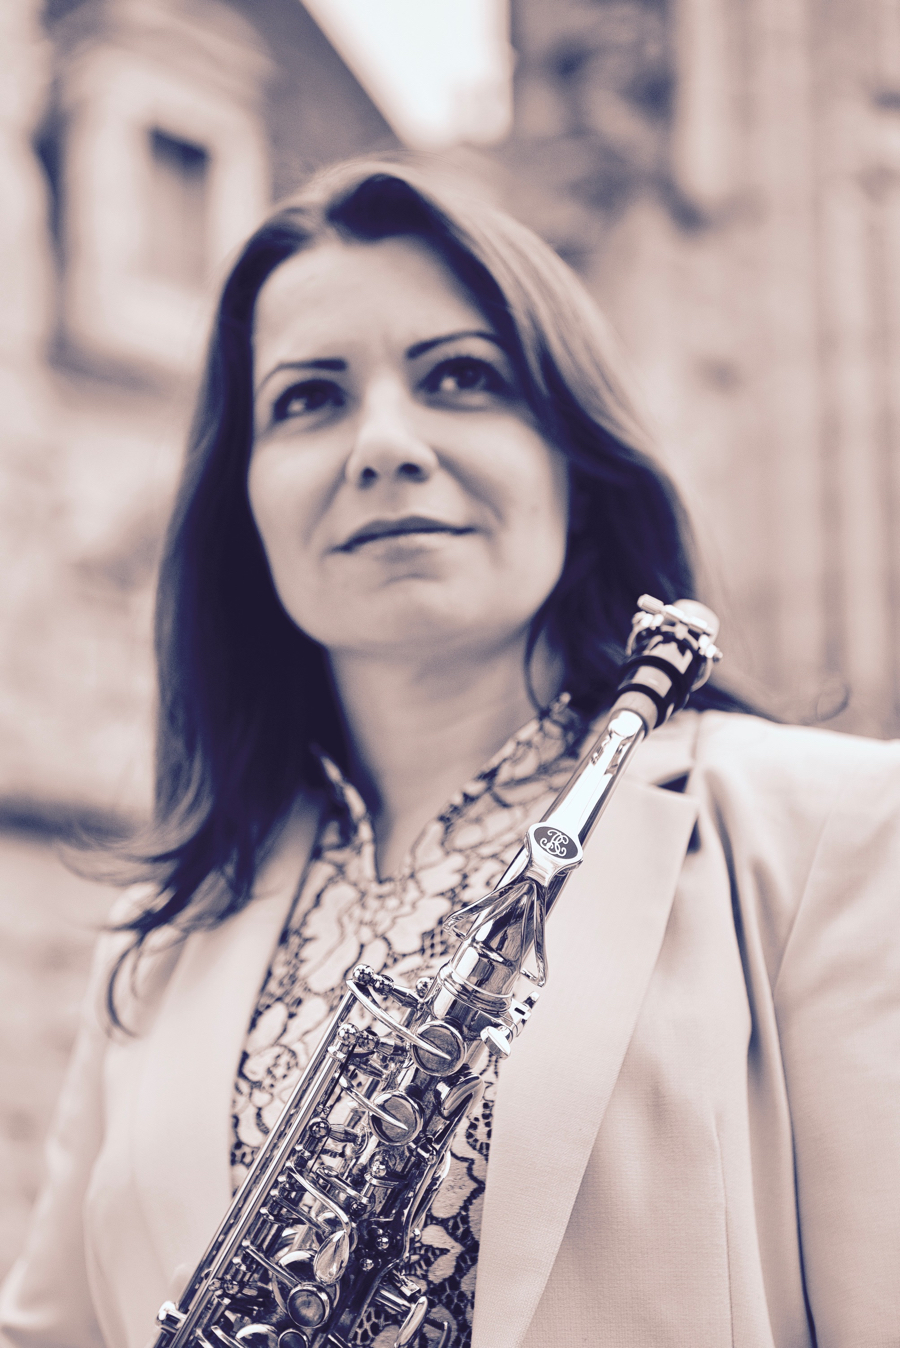 Véronique TARDIF Photo 1 - Ambassadrice Ligature JLV pour saxophone